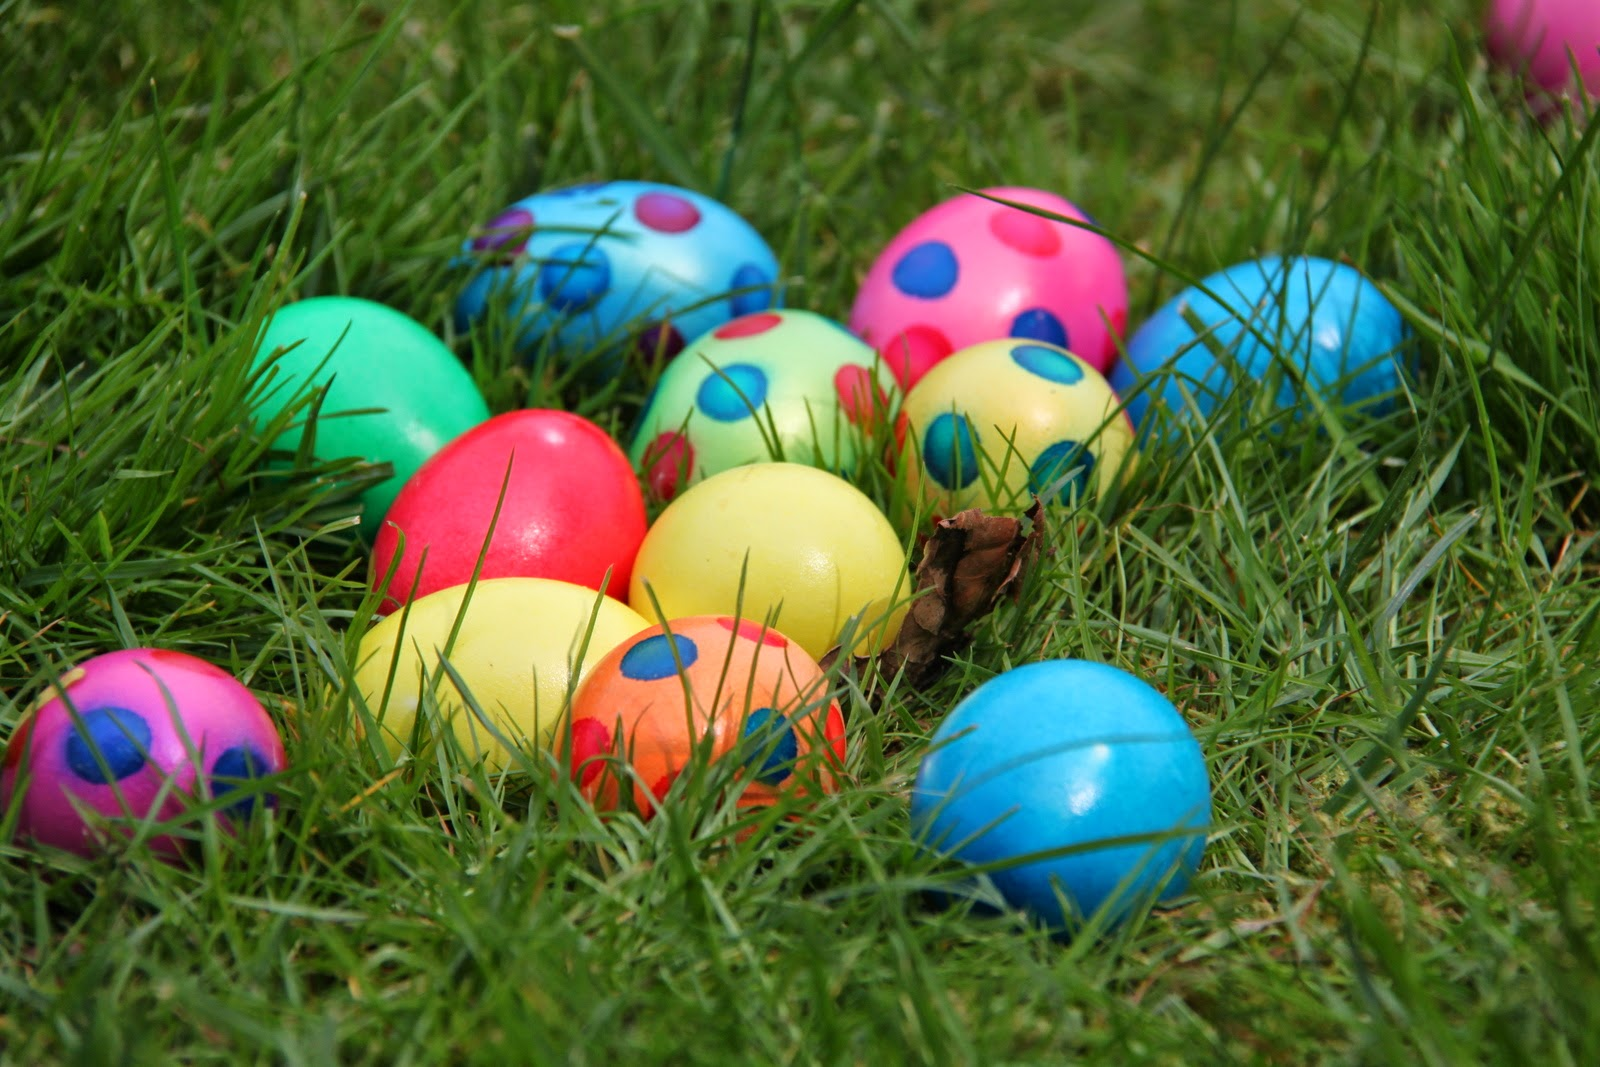 http://www.christinalake.ca/wp1/index.php/calendar/easter-egg-hunt/?instance_id=